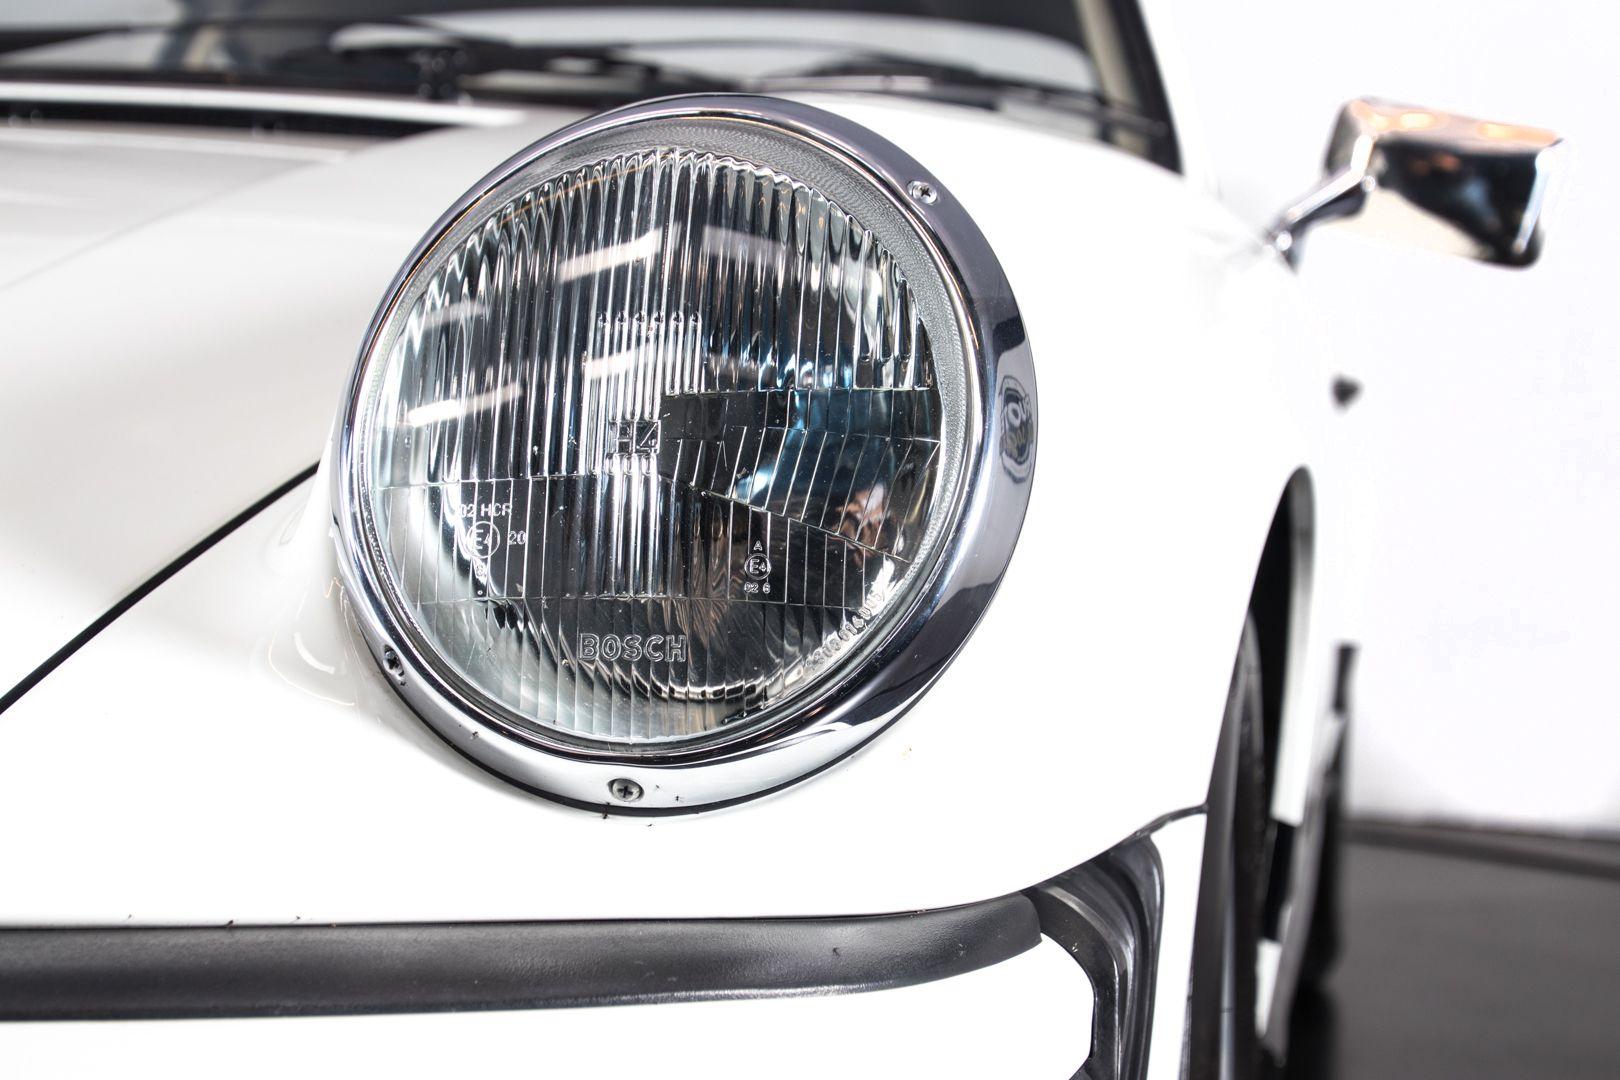 1973 Porsche 911 Carrera 2.7 26480